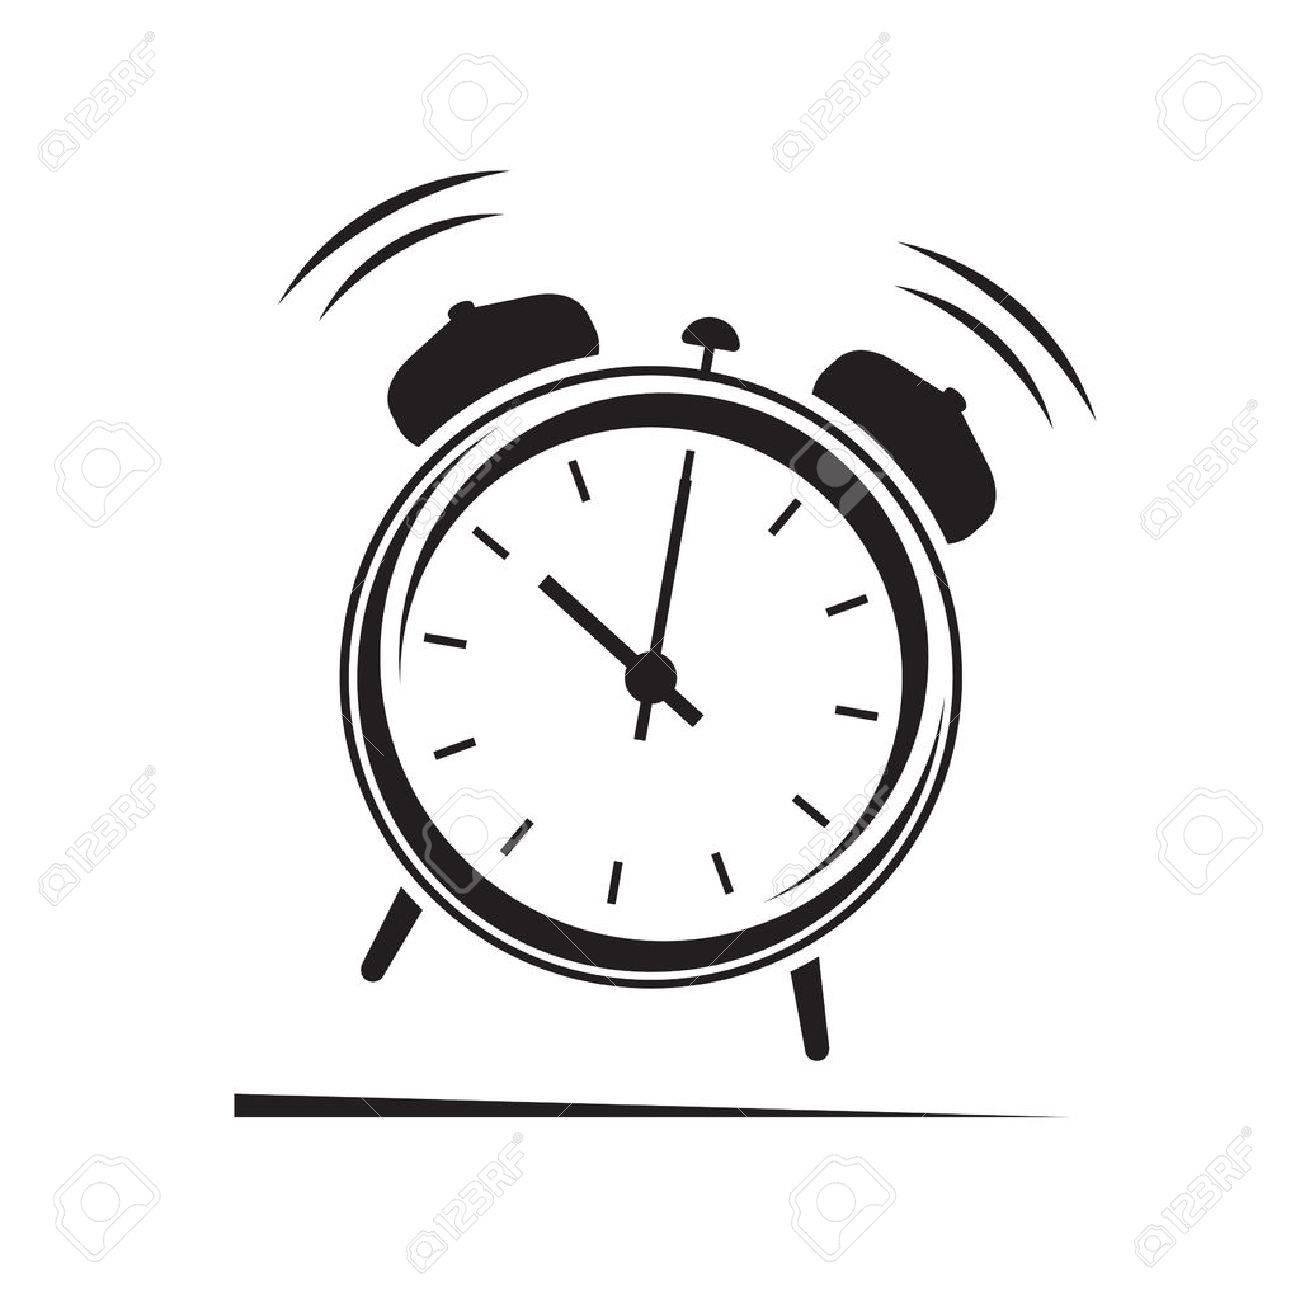 Alarm clock icon - 59122848